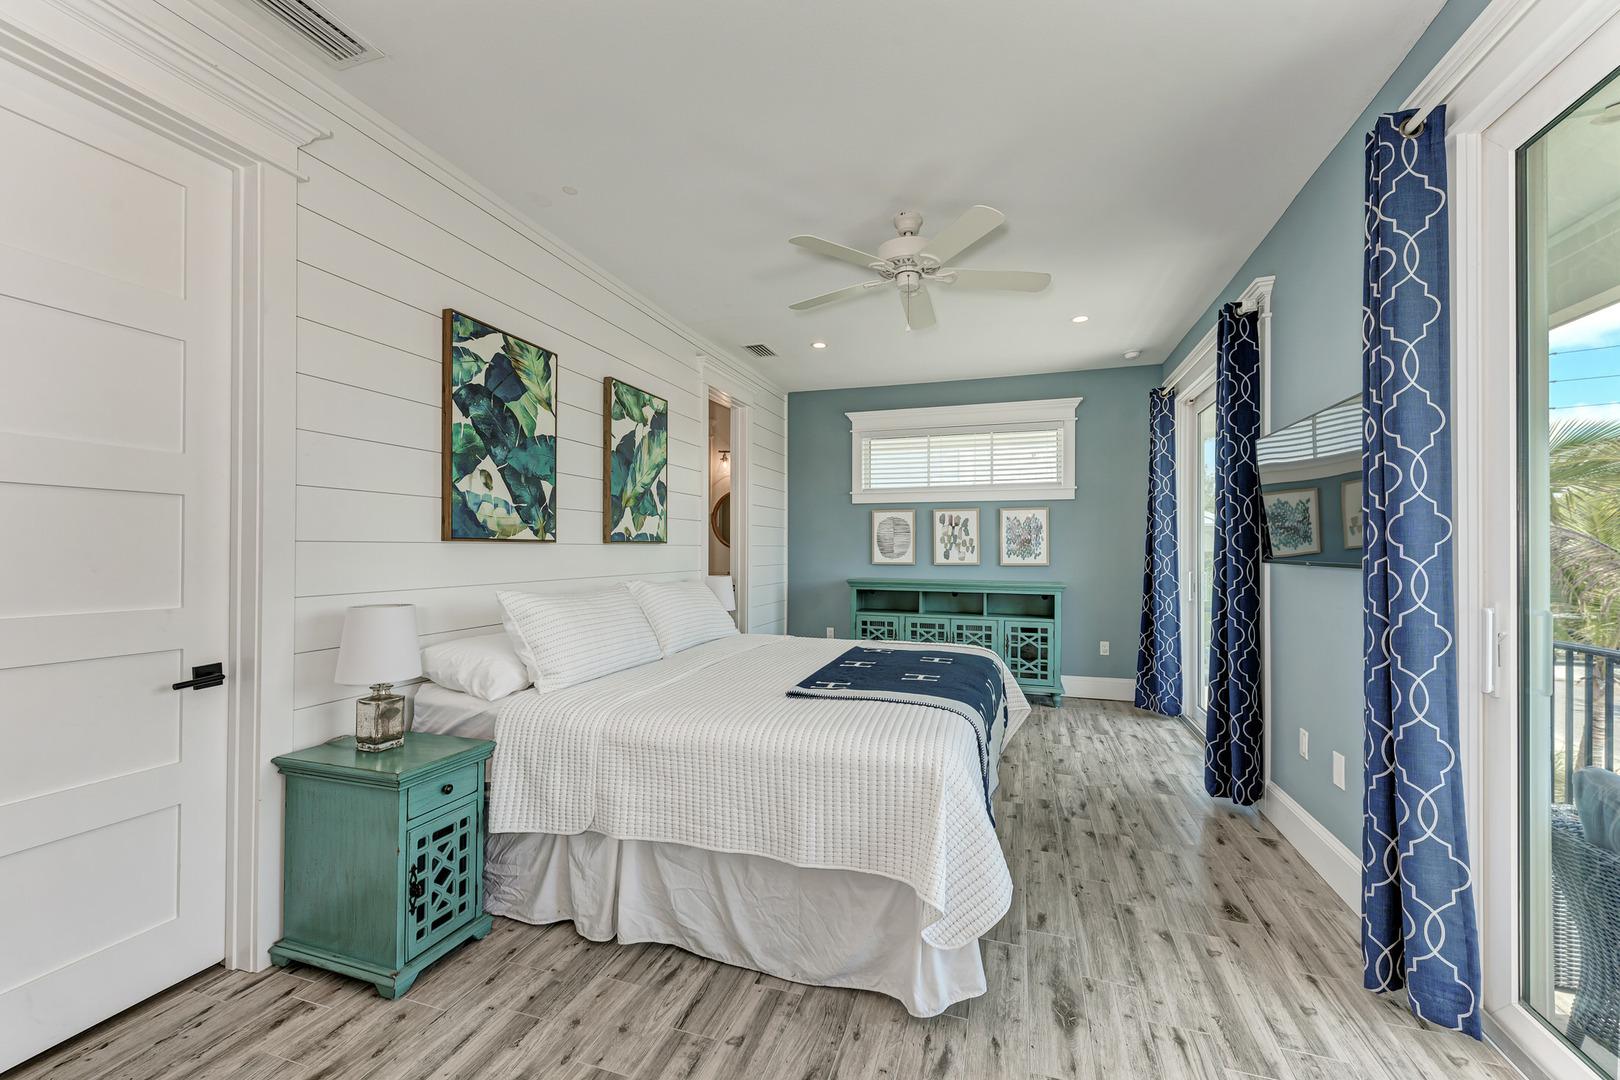 4 Sandpipers master bedroom